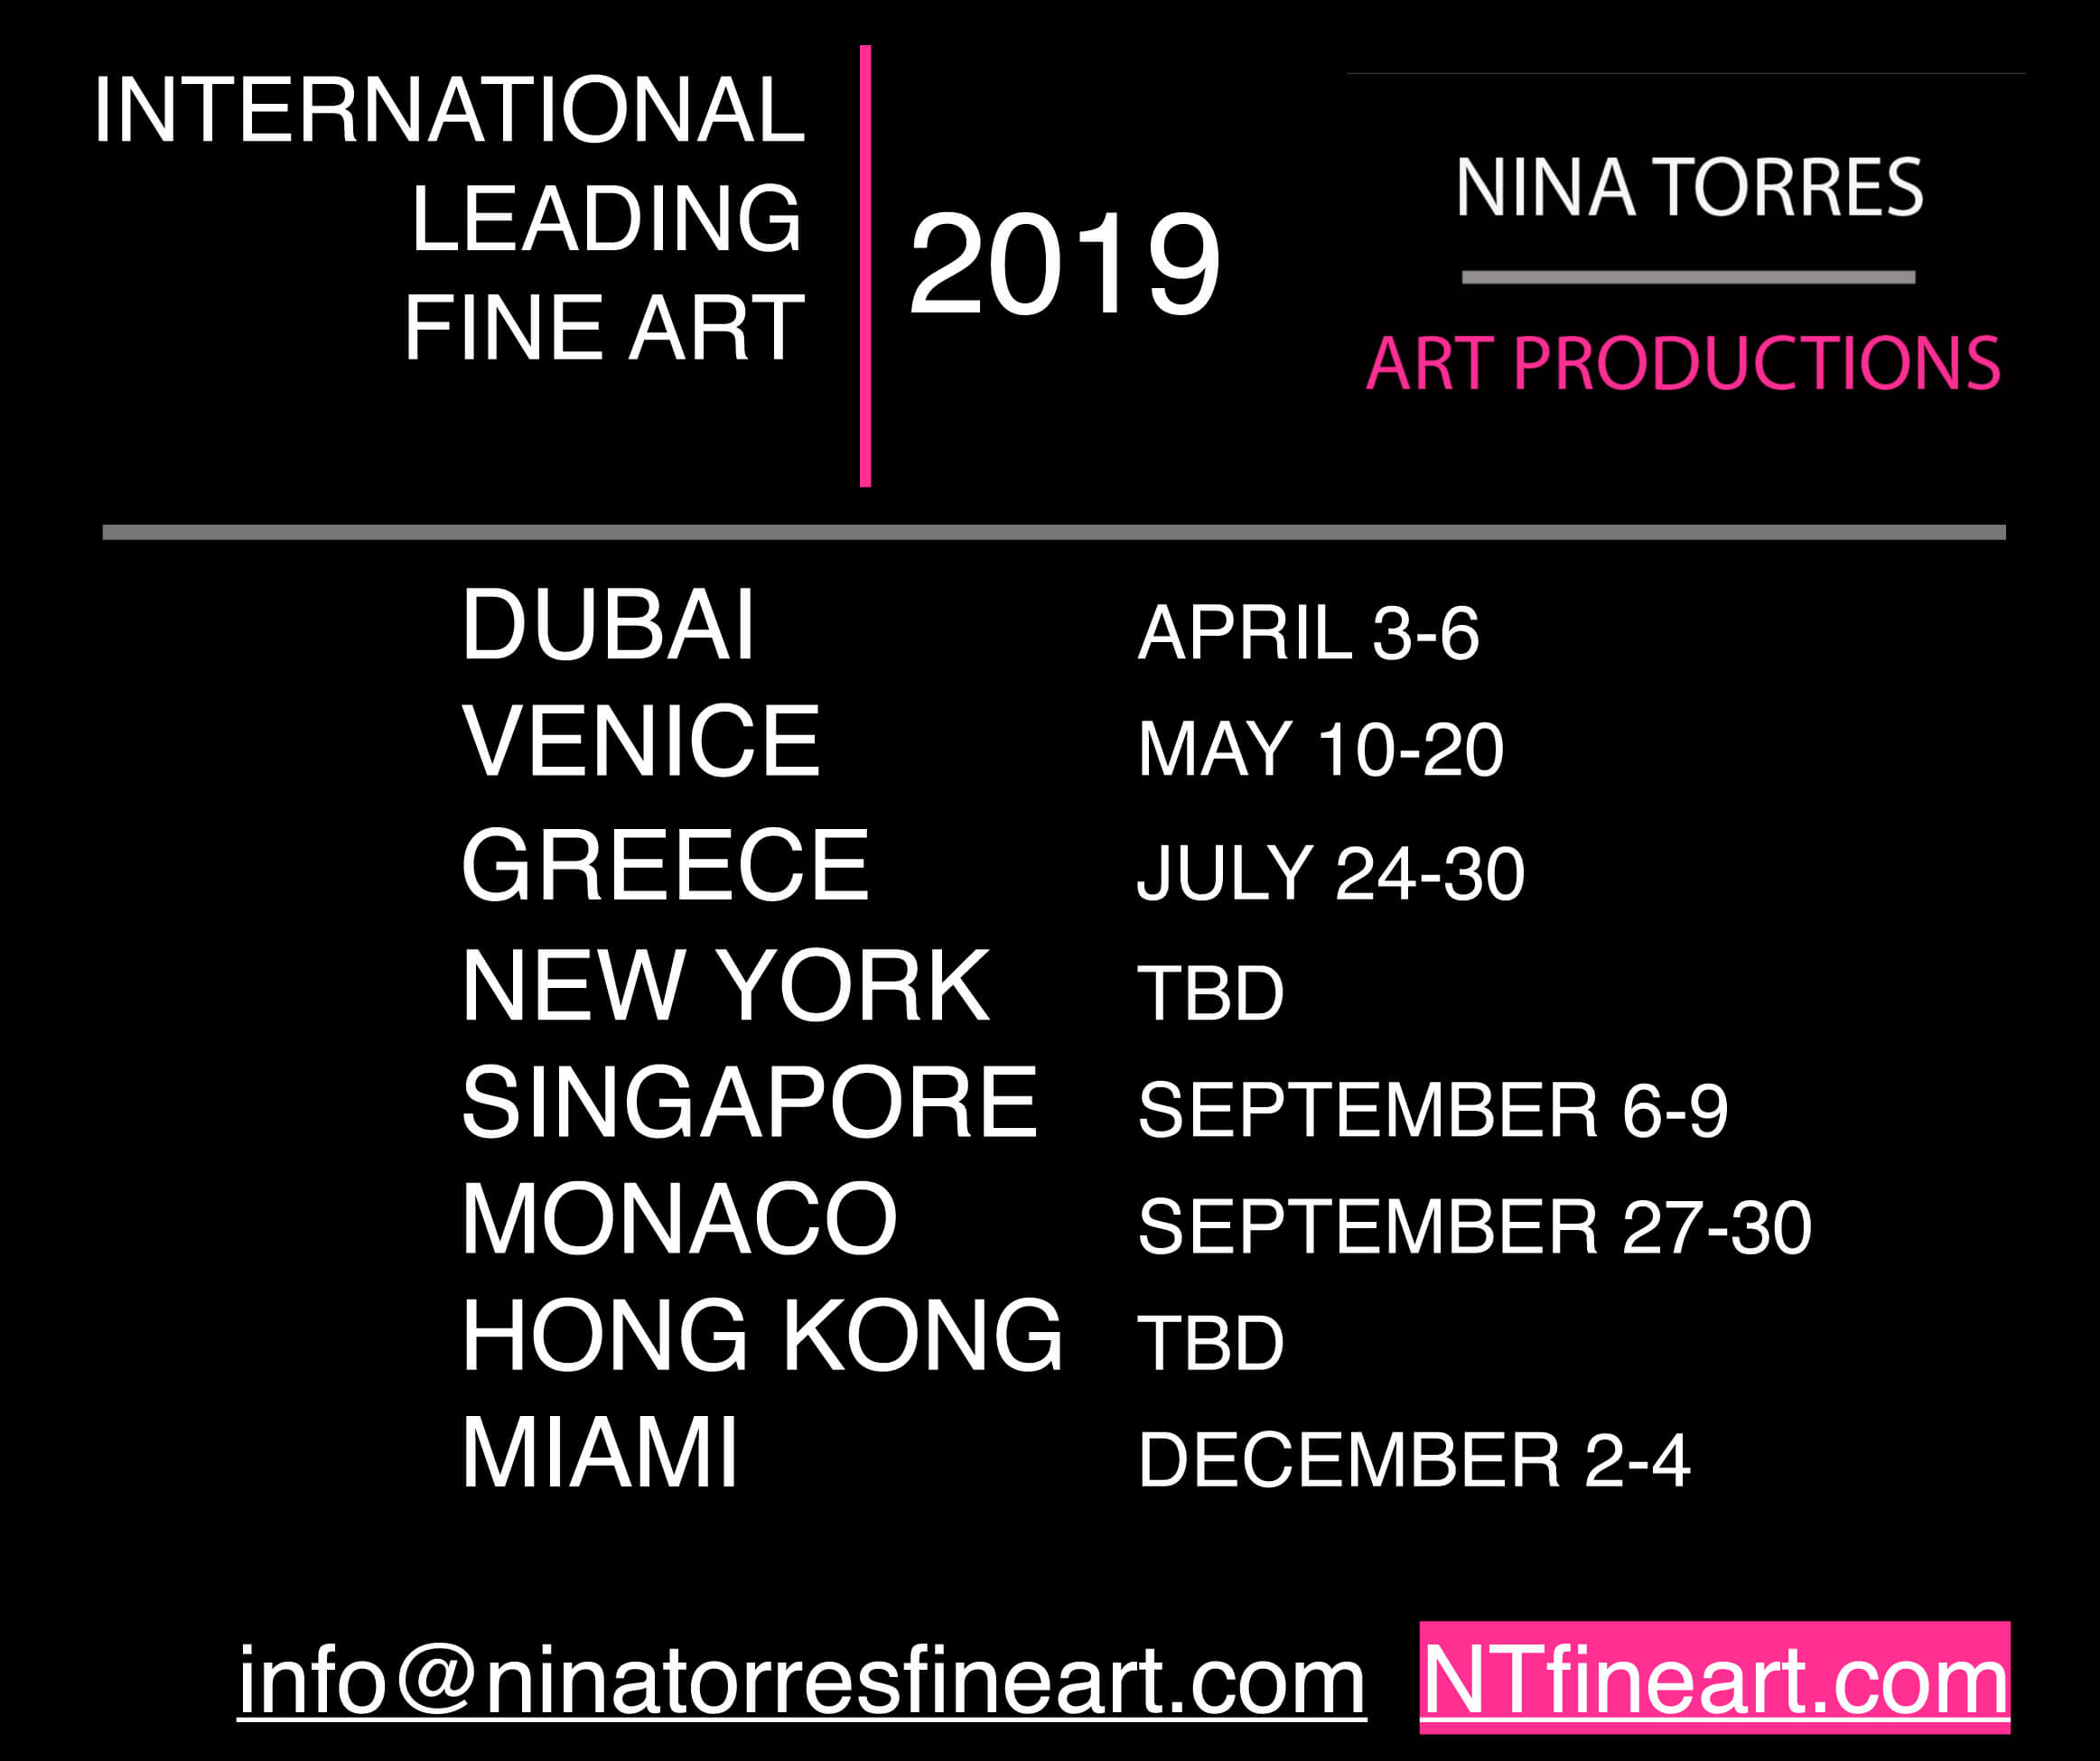 WORLD TOUR EXHIBITION OF CONTEMPORARY ART | WTECA